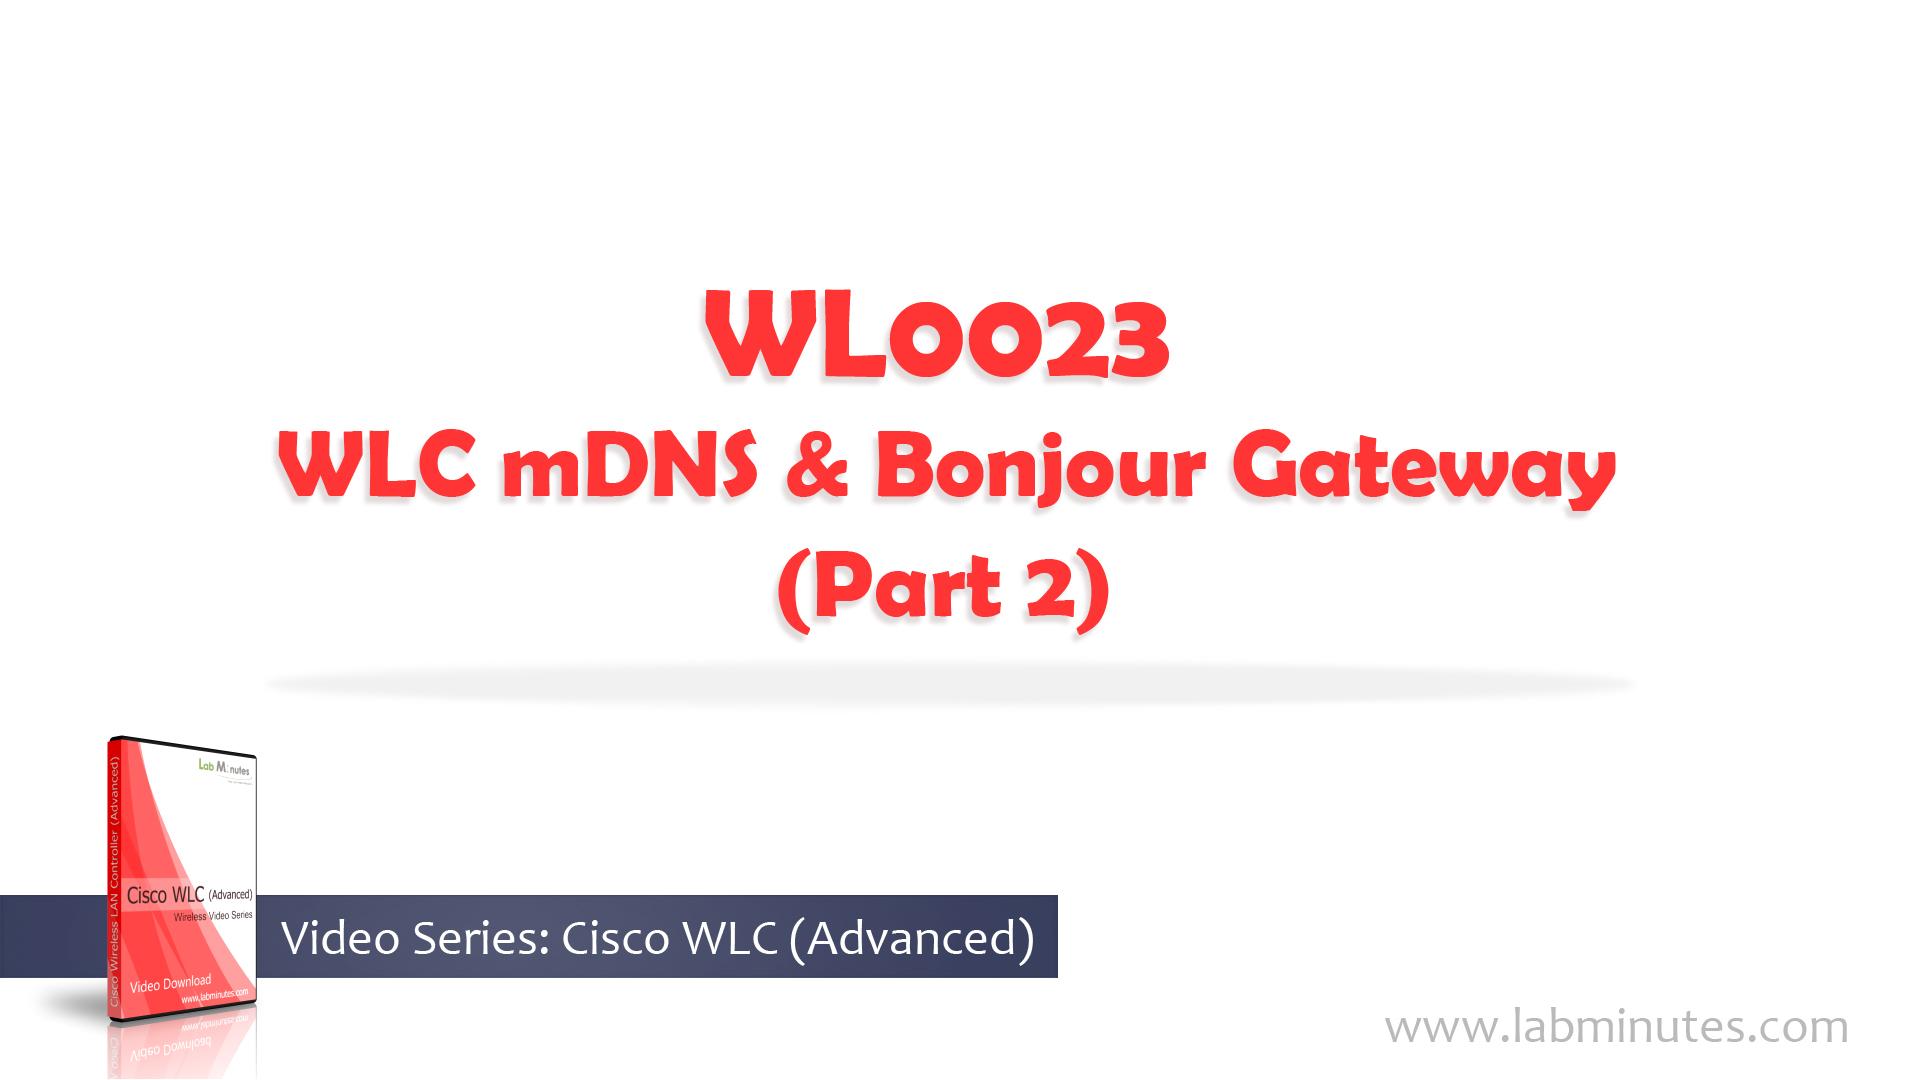 How to Configure Cisco WLC mDNS and Bonjour Gateway (Part 2)